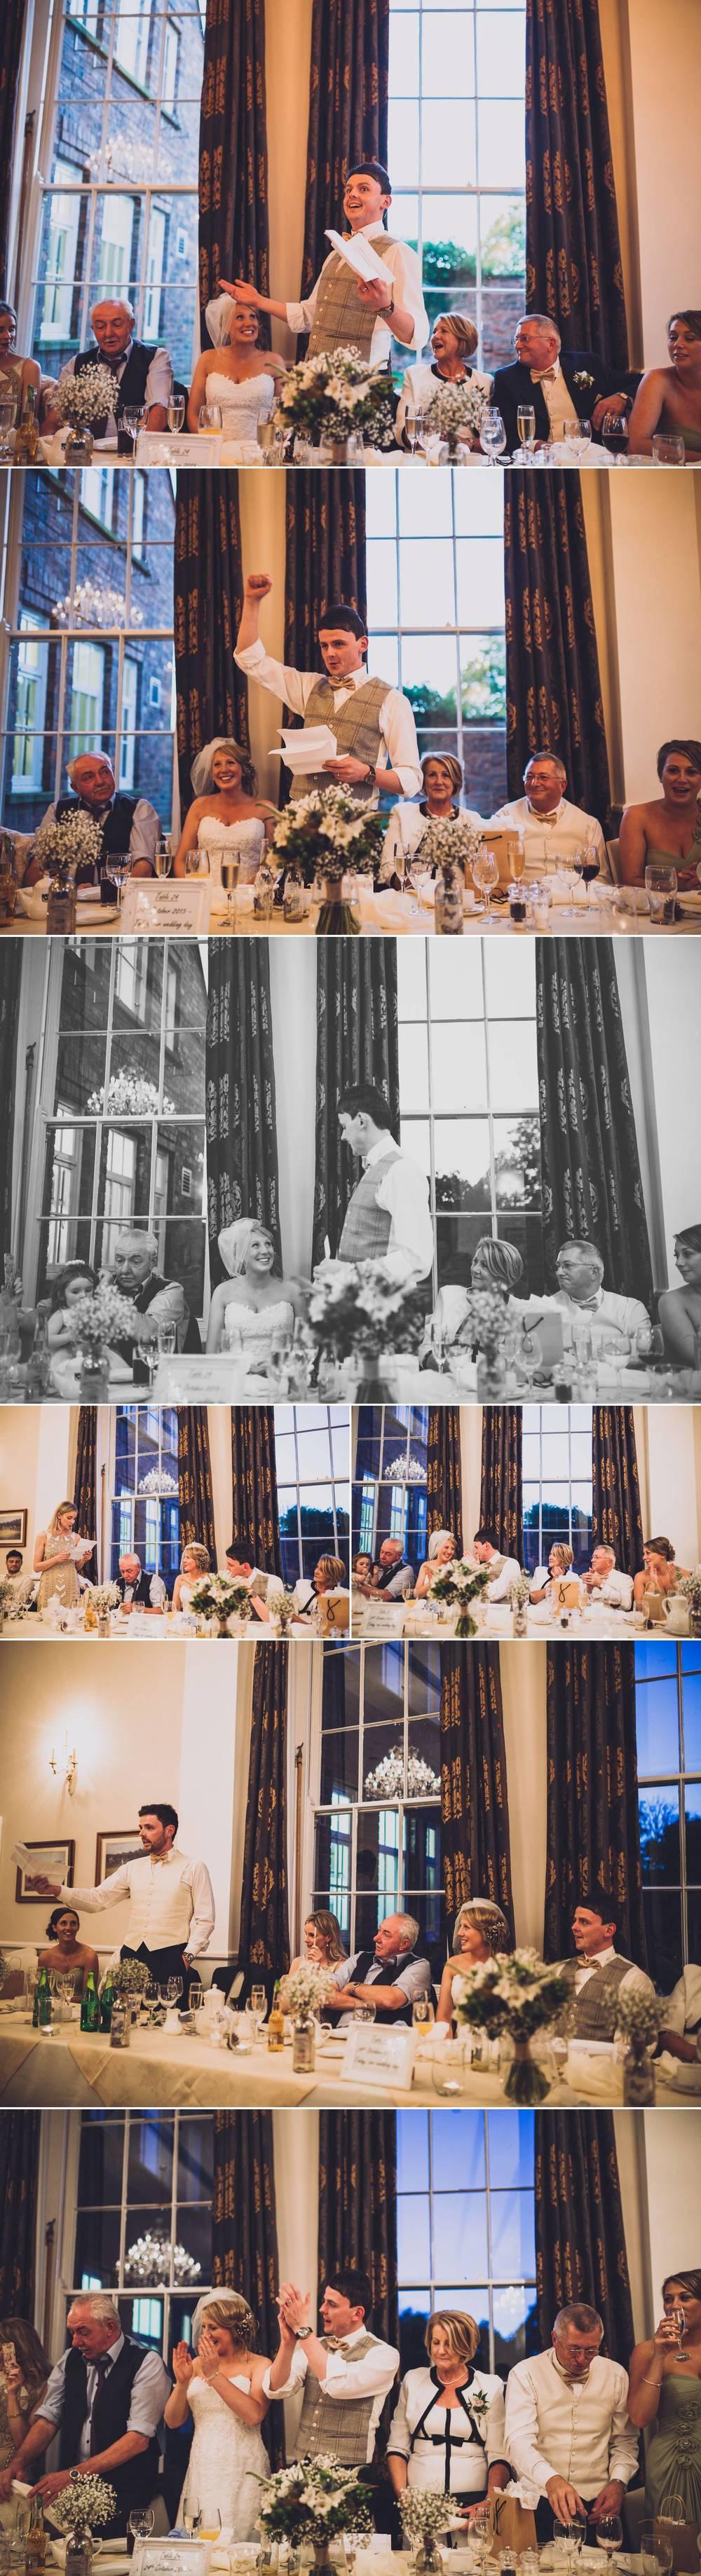 wedding-photographer-staffordshire 18.jpg